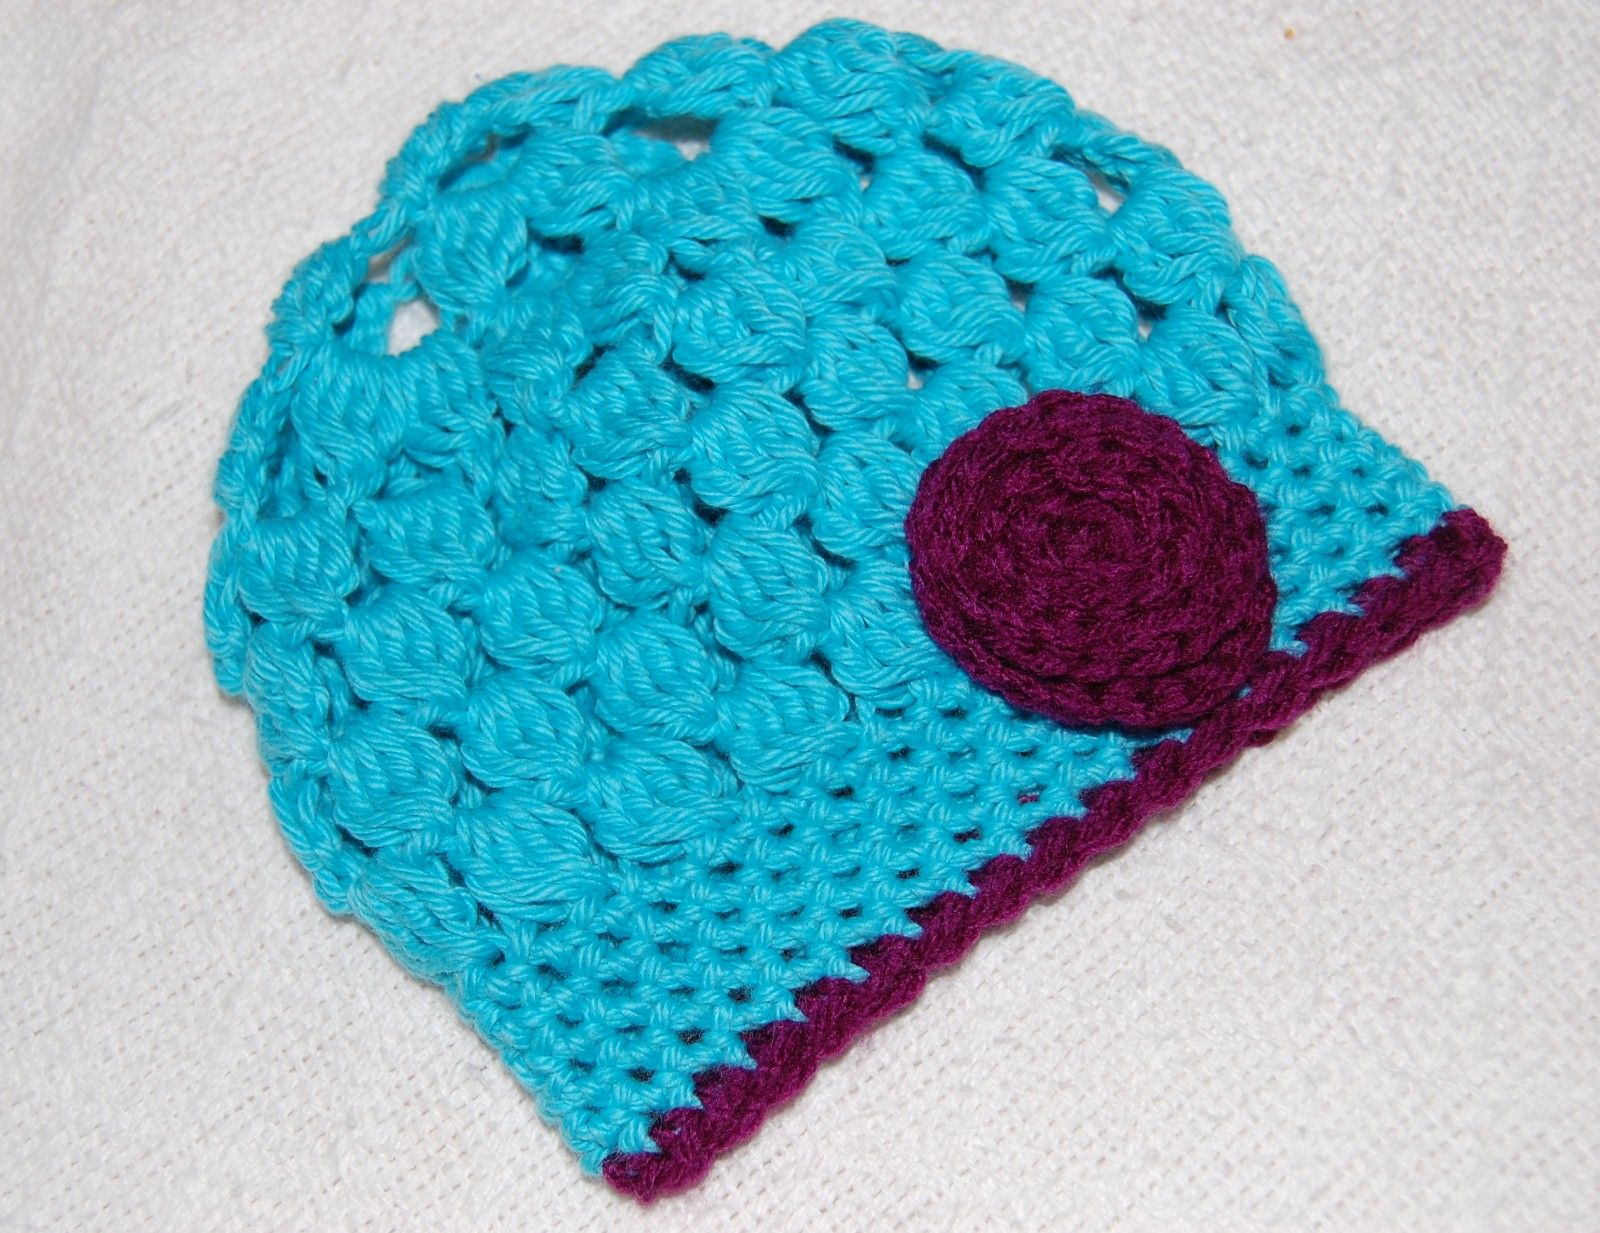 Lanie Hat in bright teal. 100% cotton.